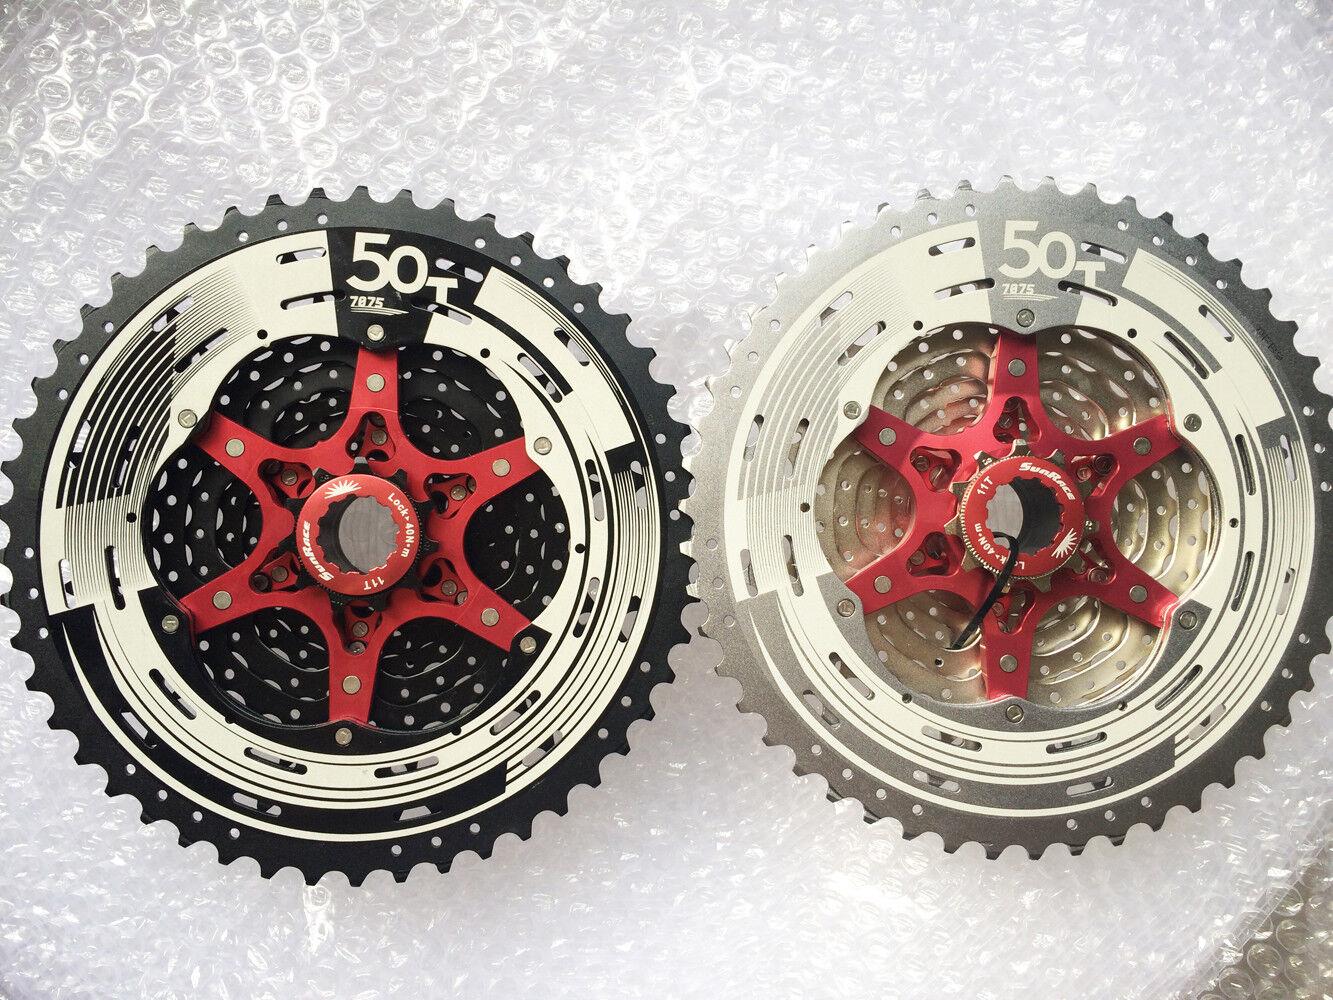 2018 Sunrace 12 Speed CSMZ90 11-50T Cassette Bicycle Wide Ratio MTB Freewheel